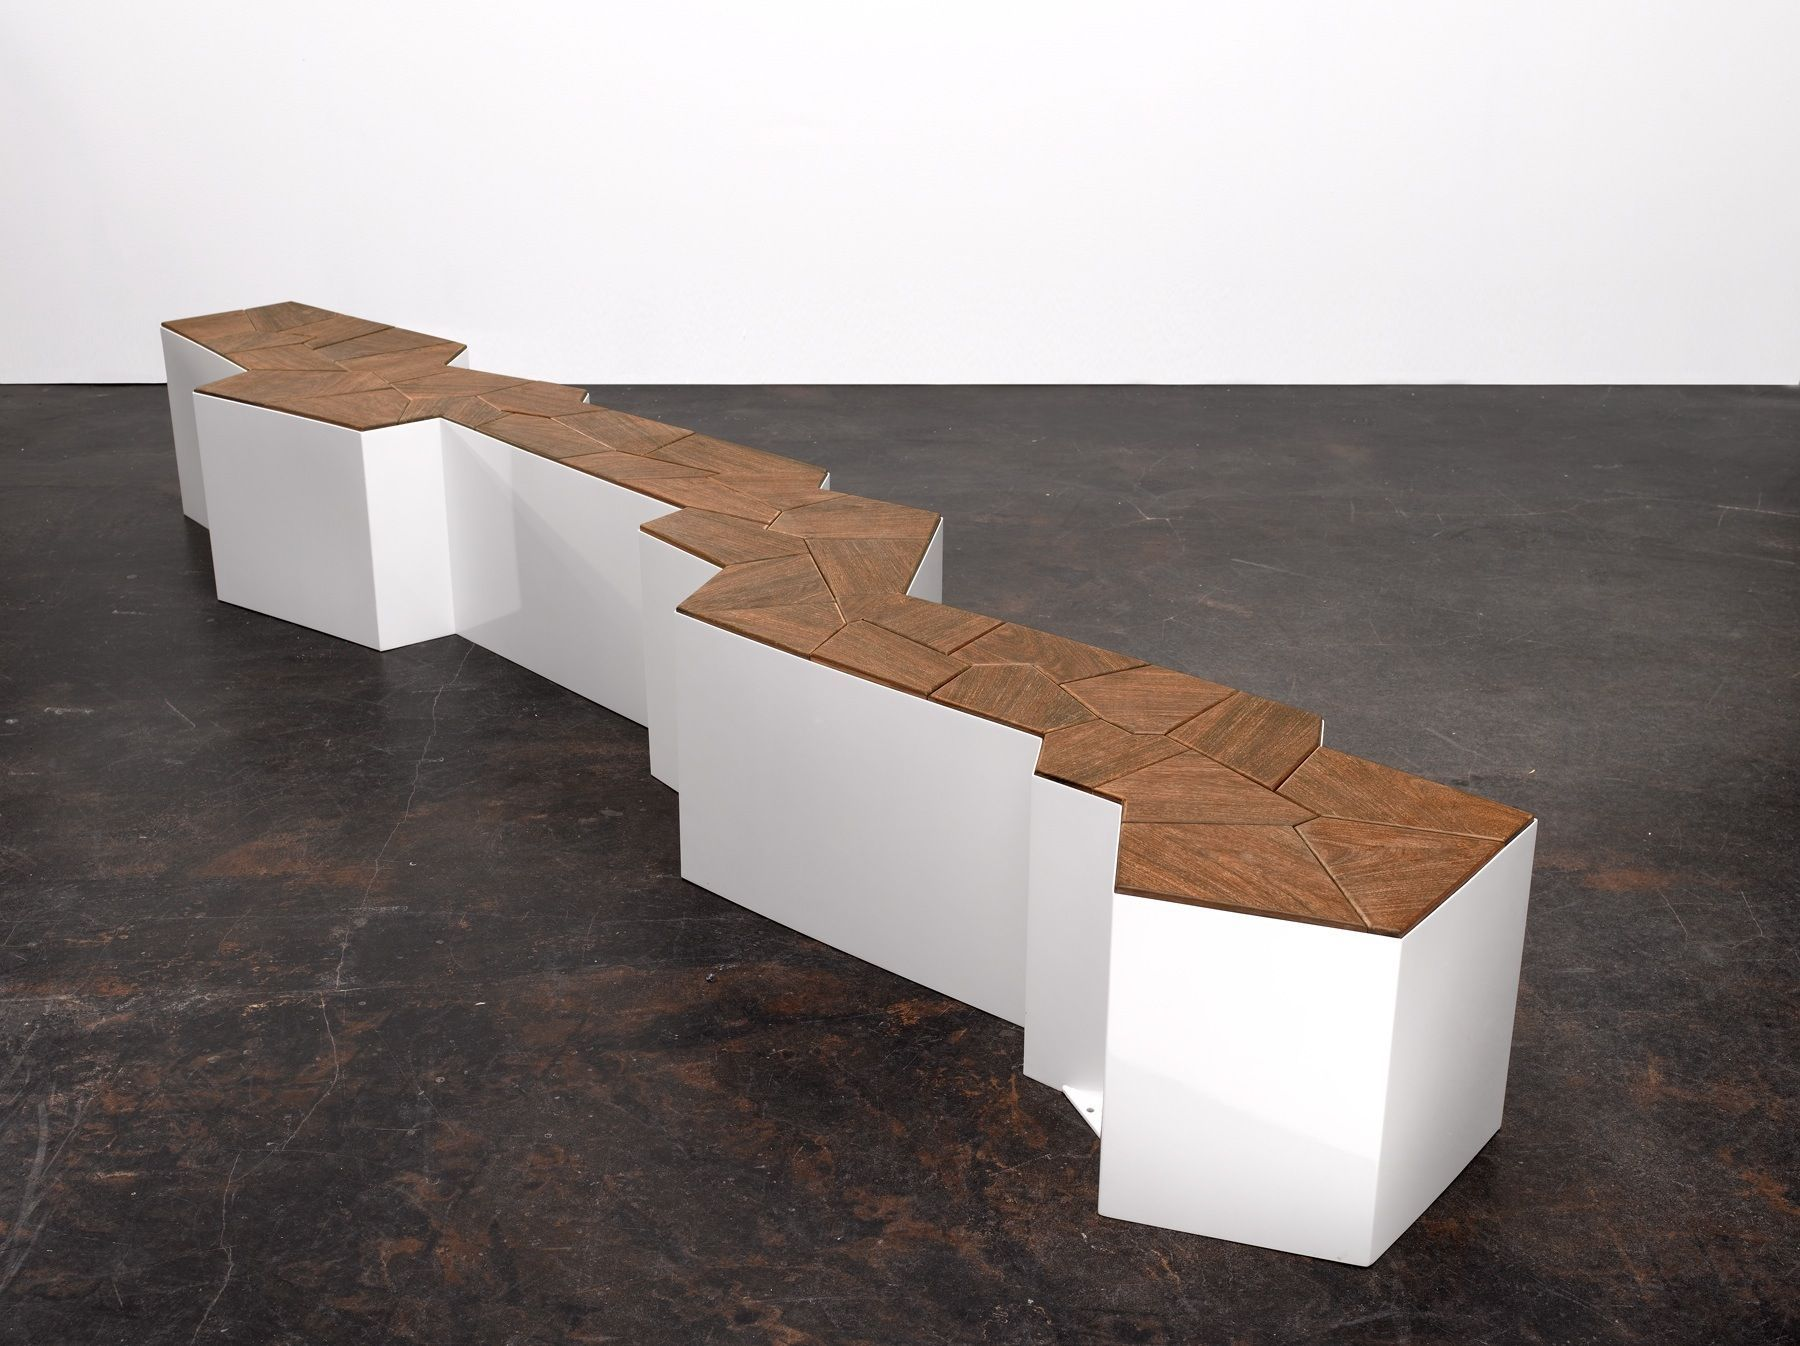 Fault Line Bench Design by Cameron Van Dyke « Furniii